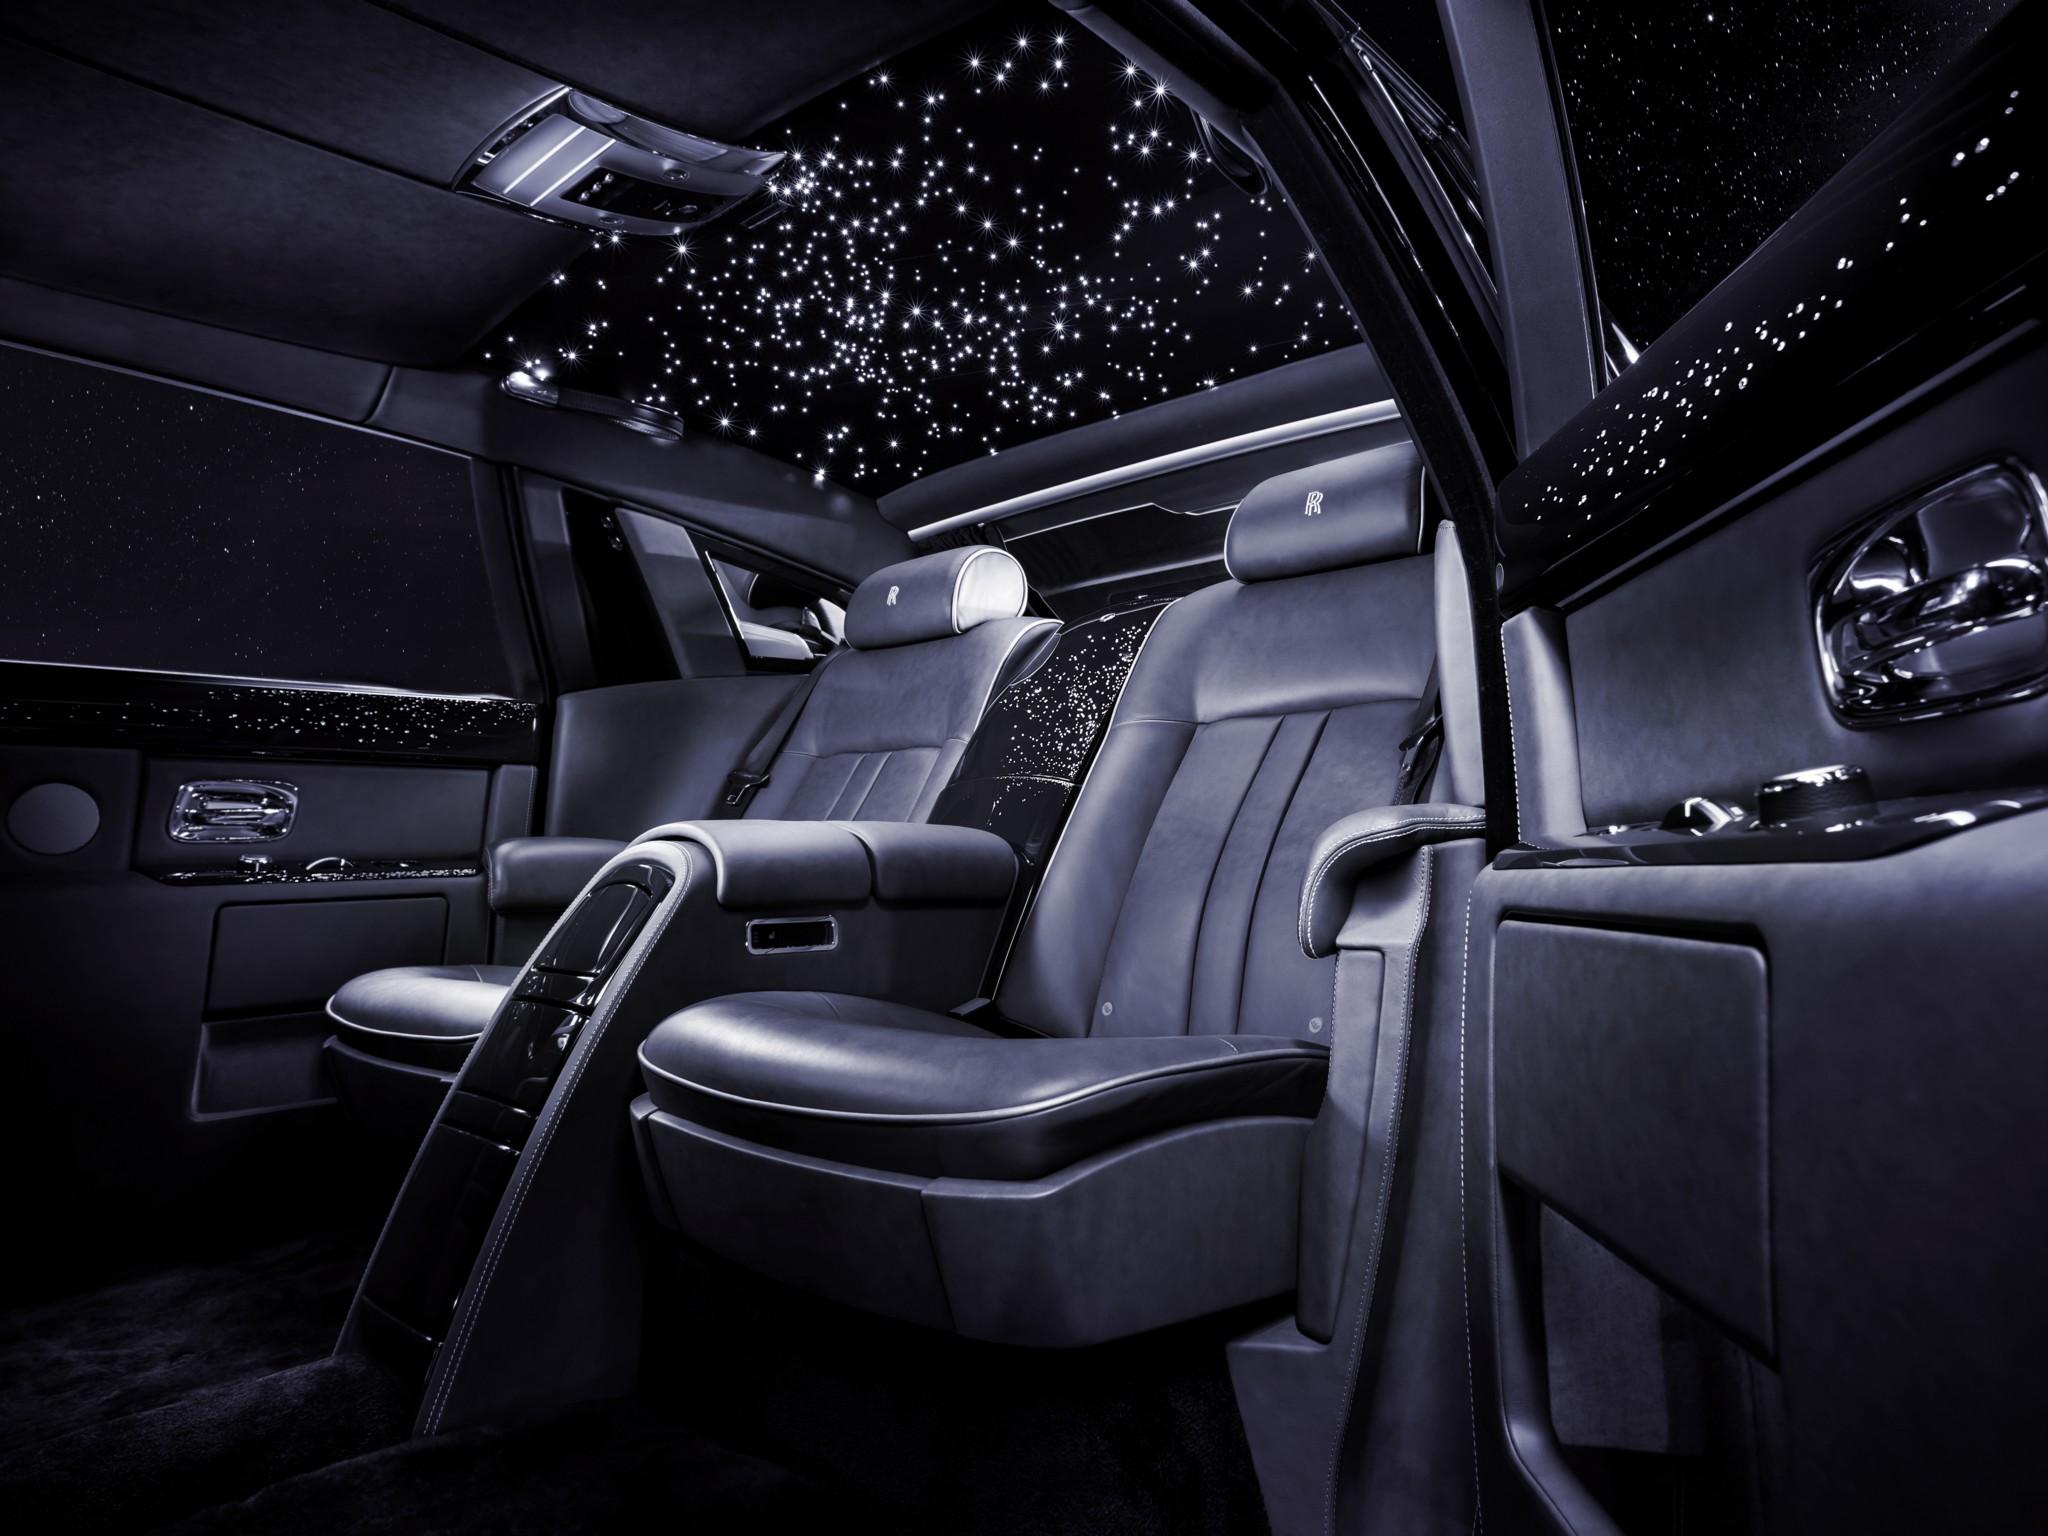 2013 Rolls Royce Phantom Celestial Luxury Interior G Wallpaper